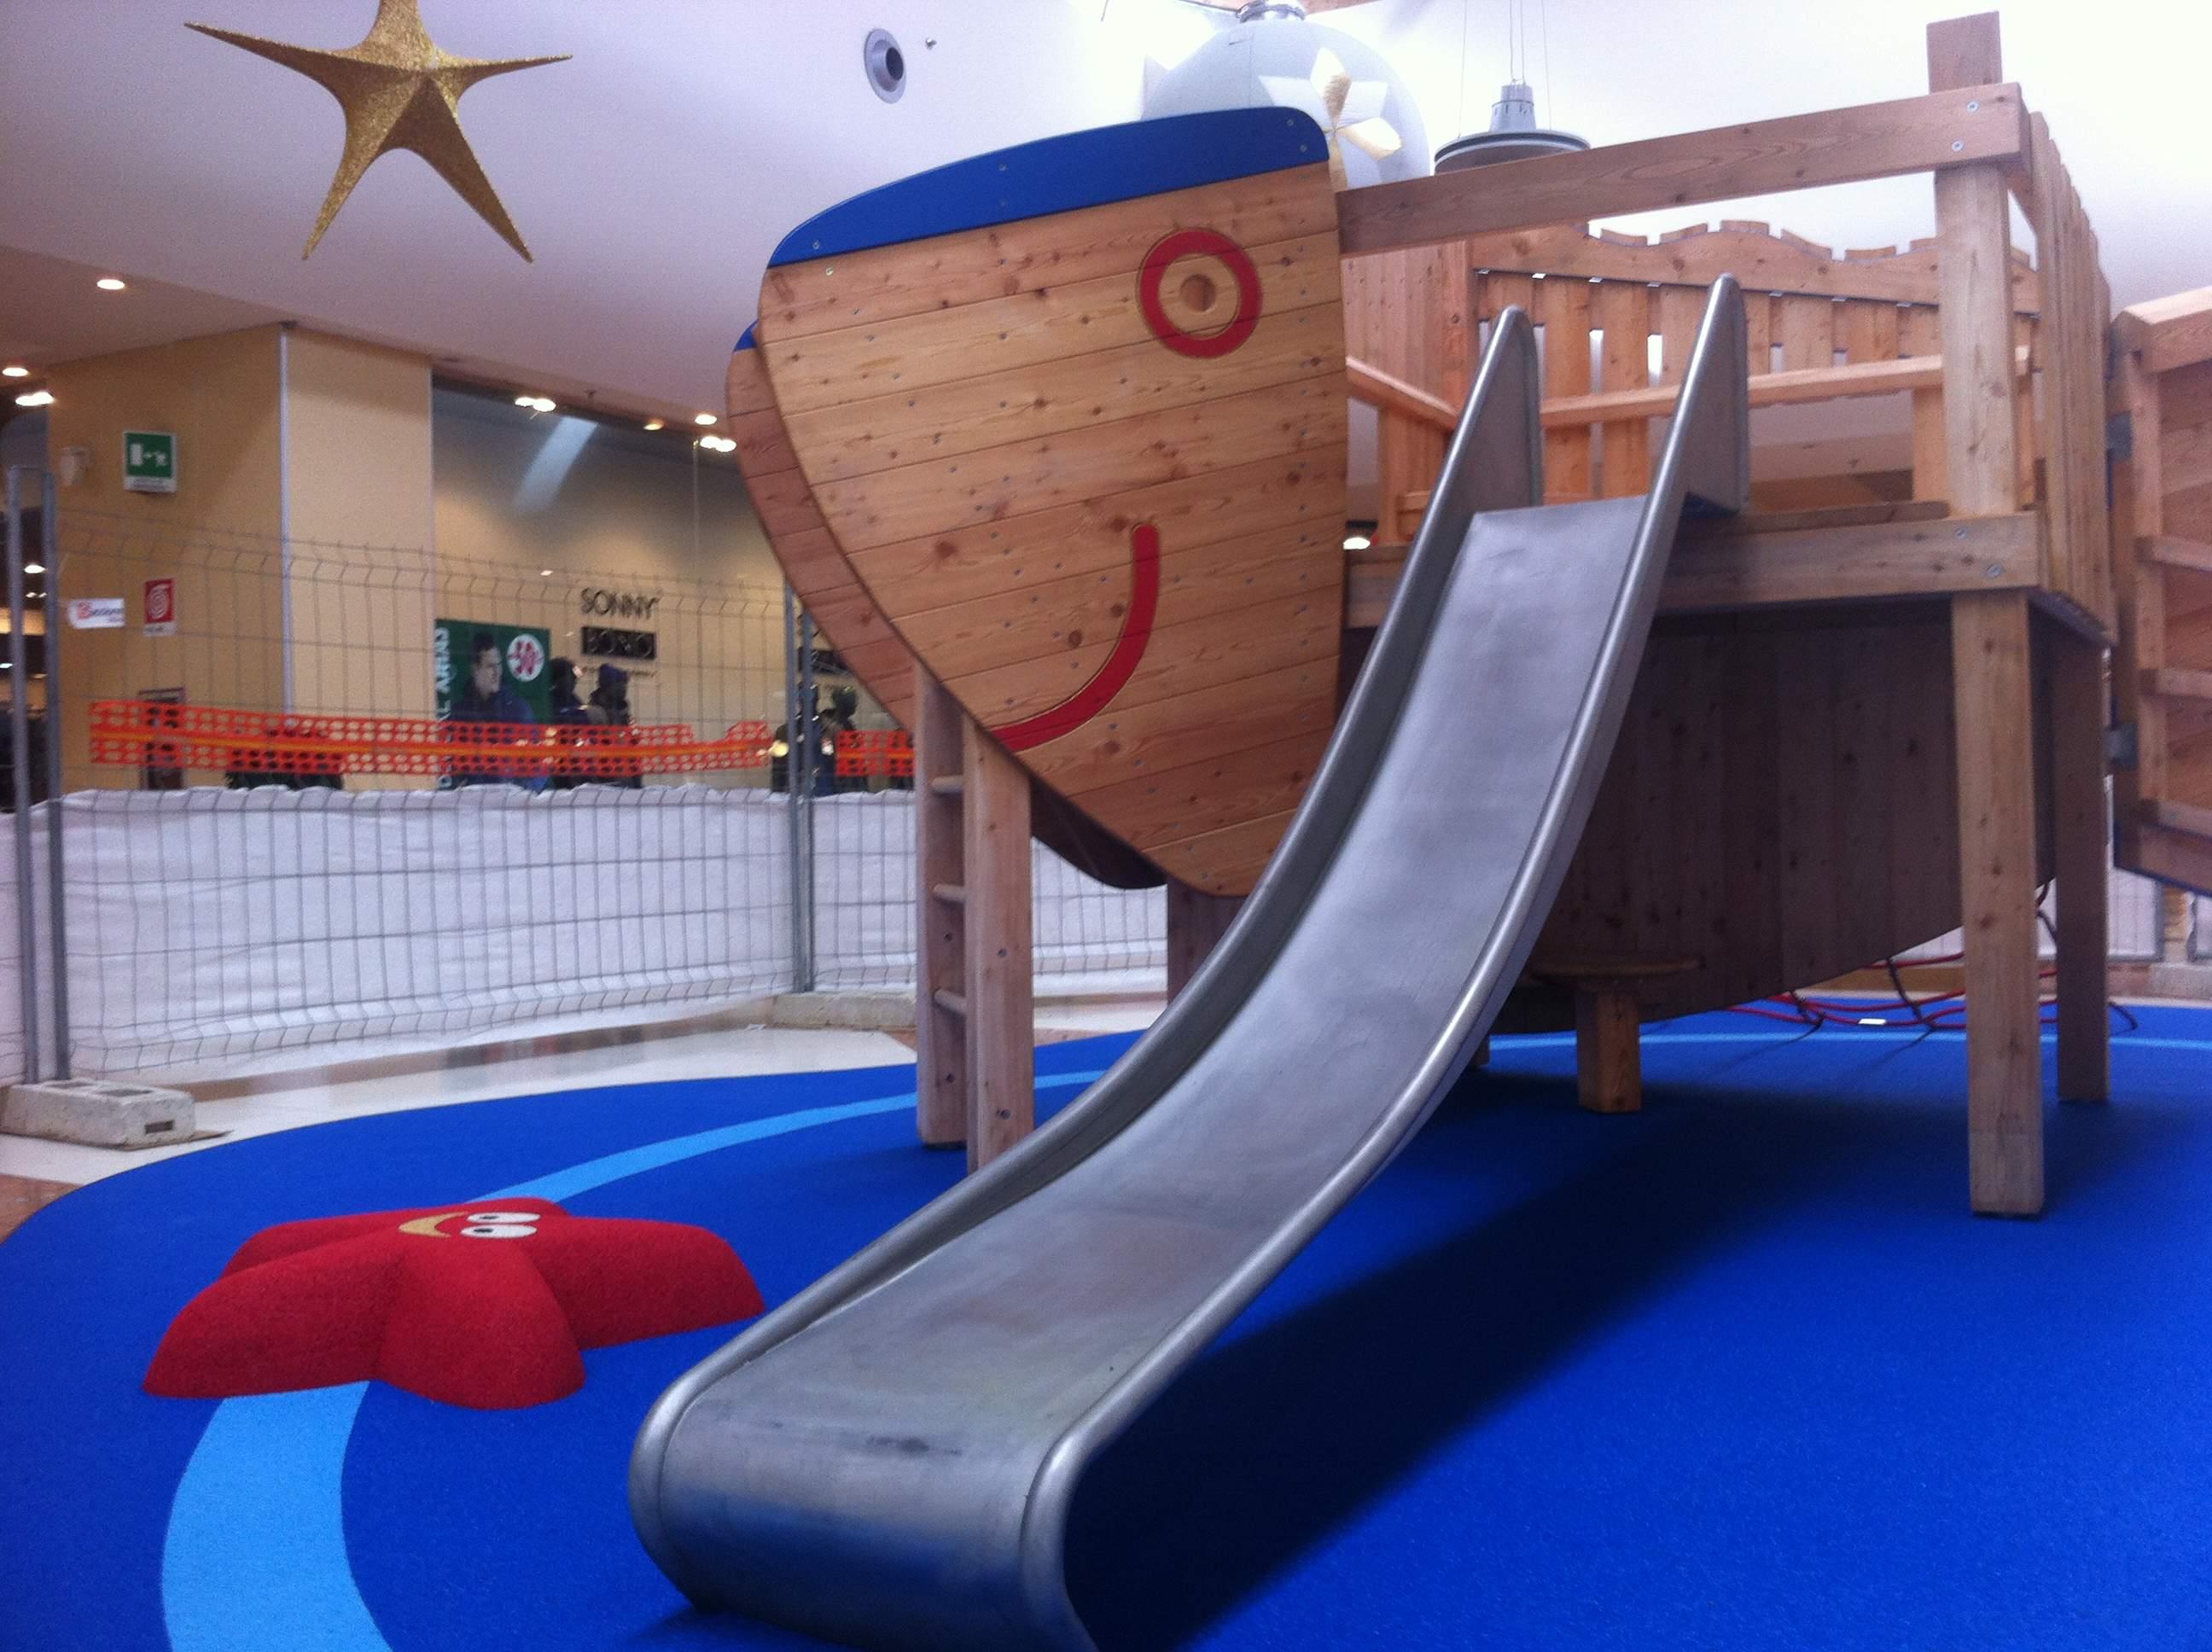 Parco giochi indoor. Pavimentazione antitrauma ignifuga